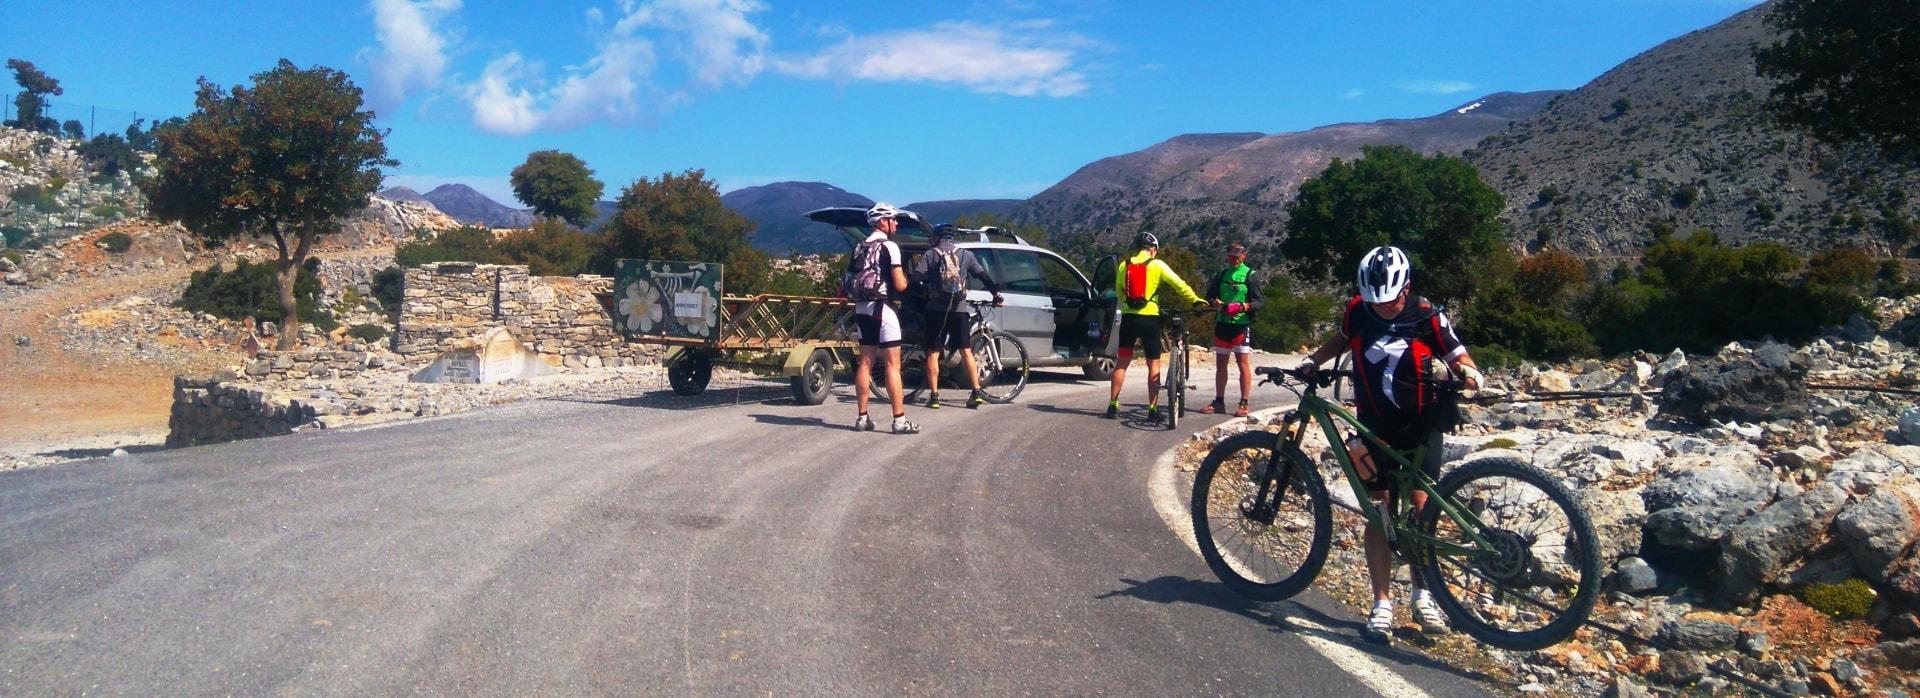 diplori car trailer and cyclists rouvas psiloritis crete